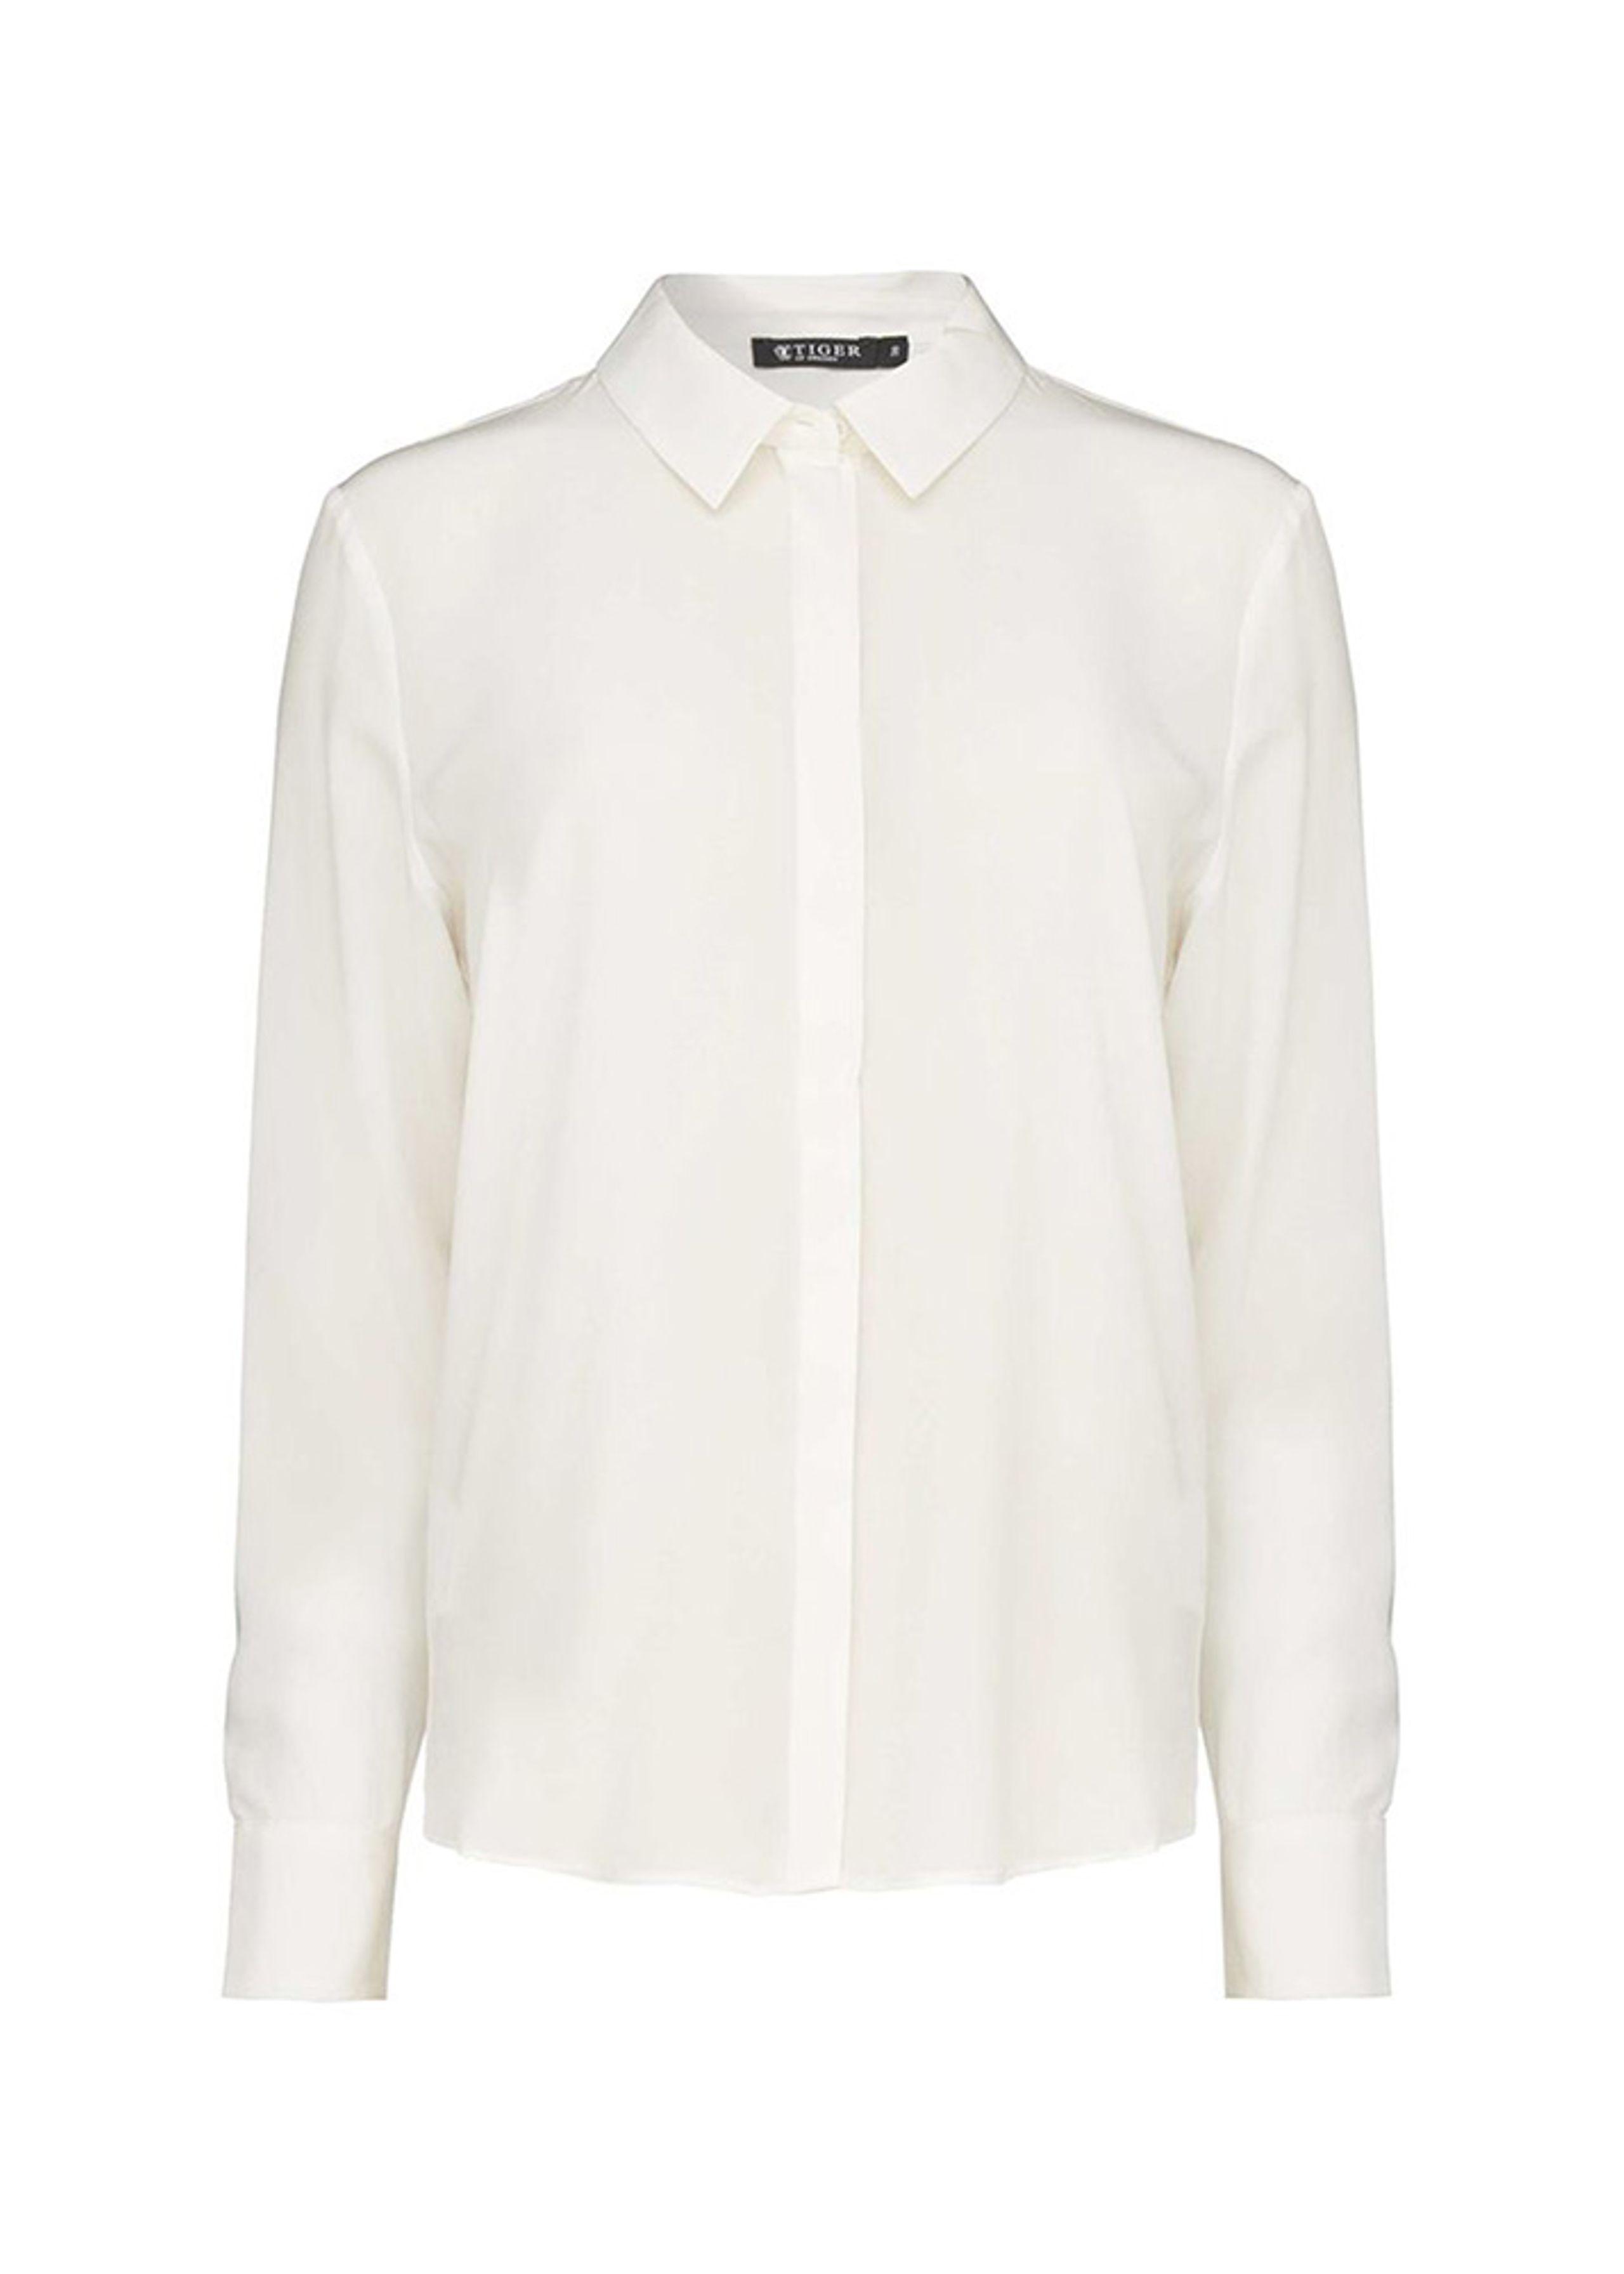 cfdf7c10933 Silwa skjorte fra Tiger of Sweden - Silkeskjorte - Hvid skjorte